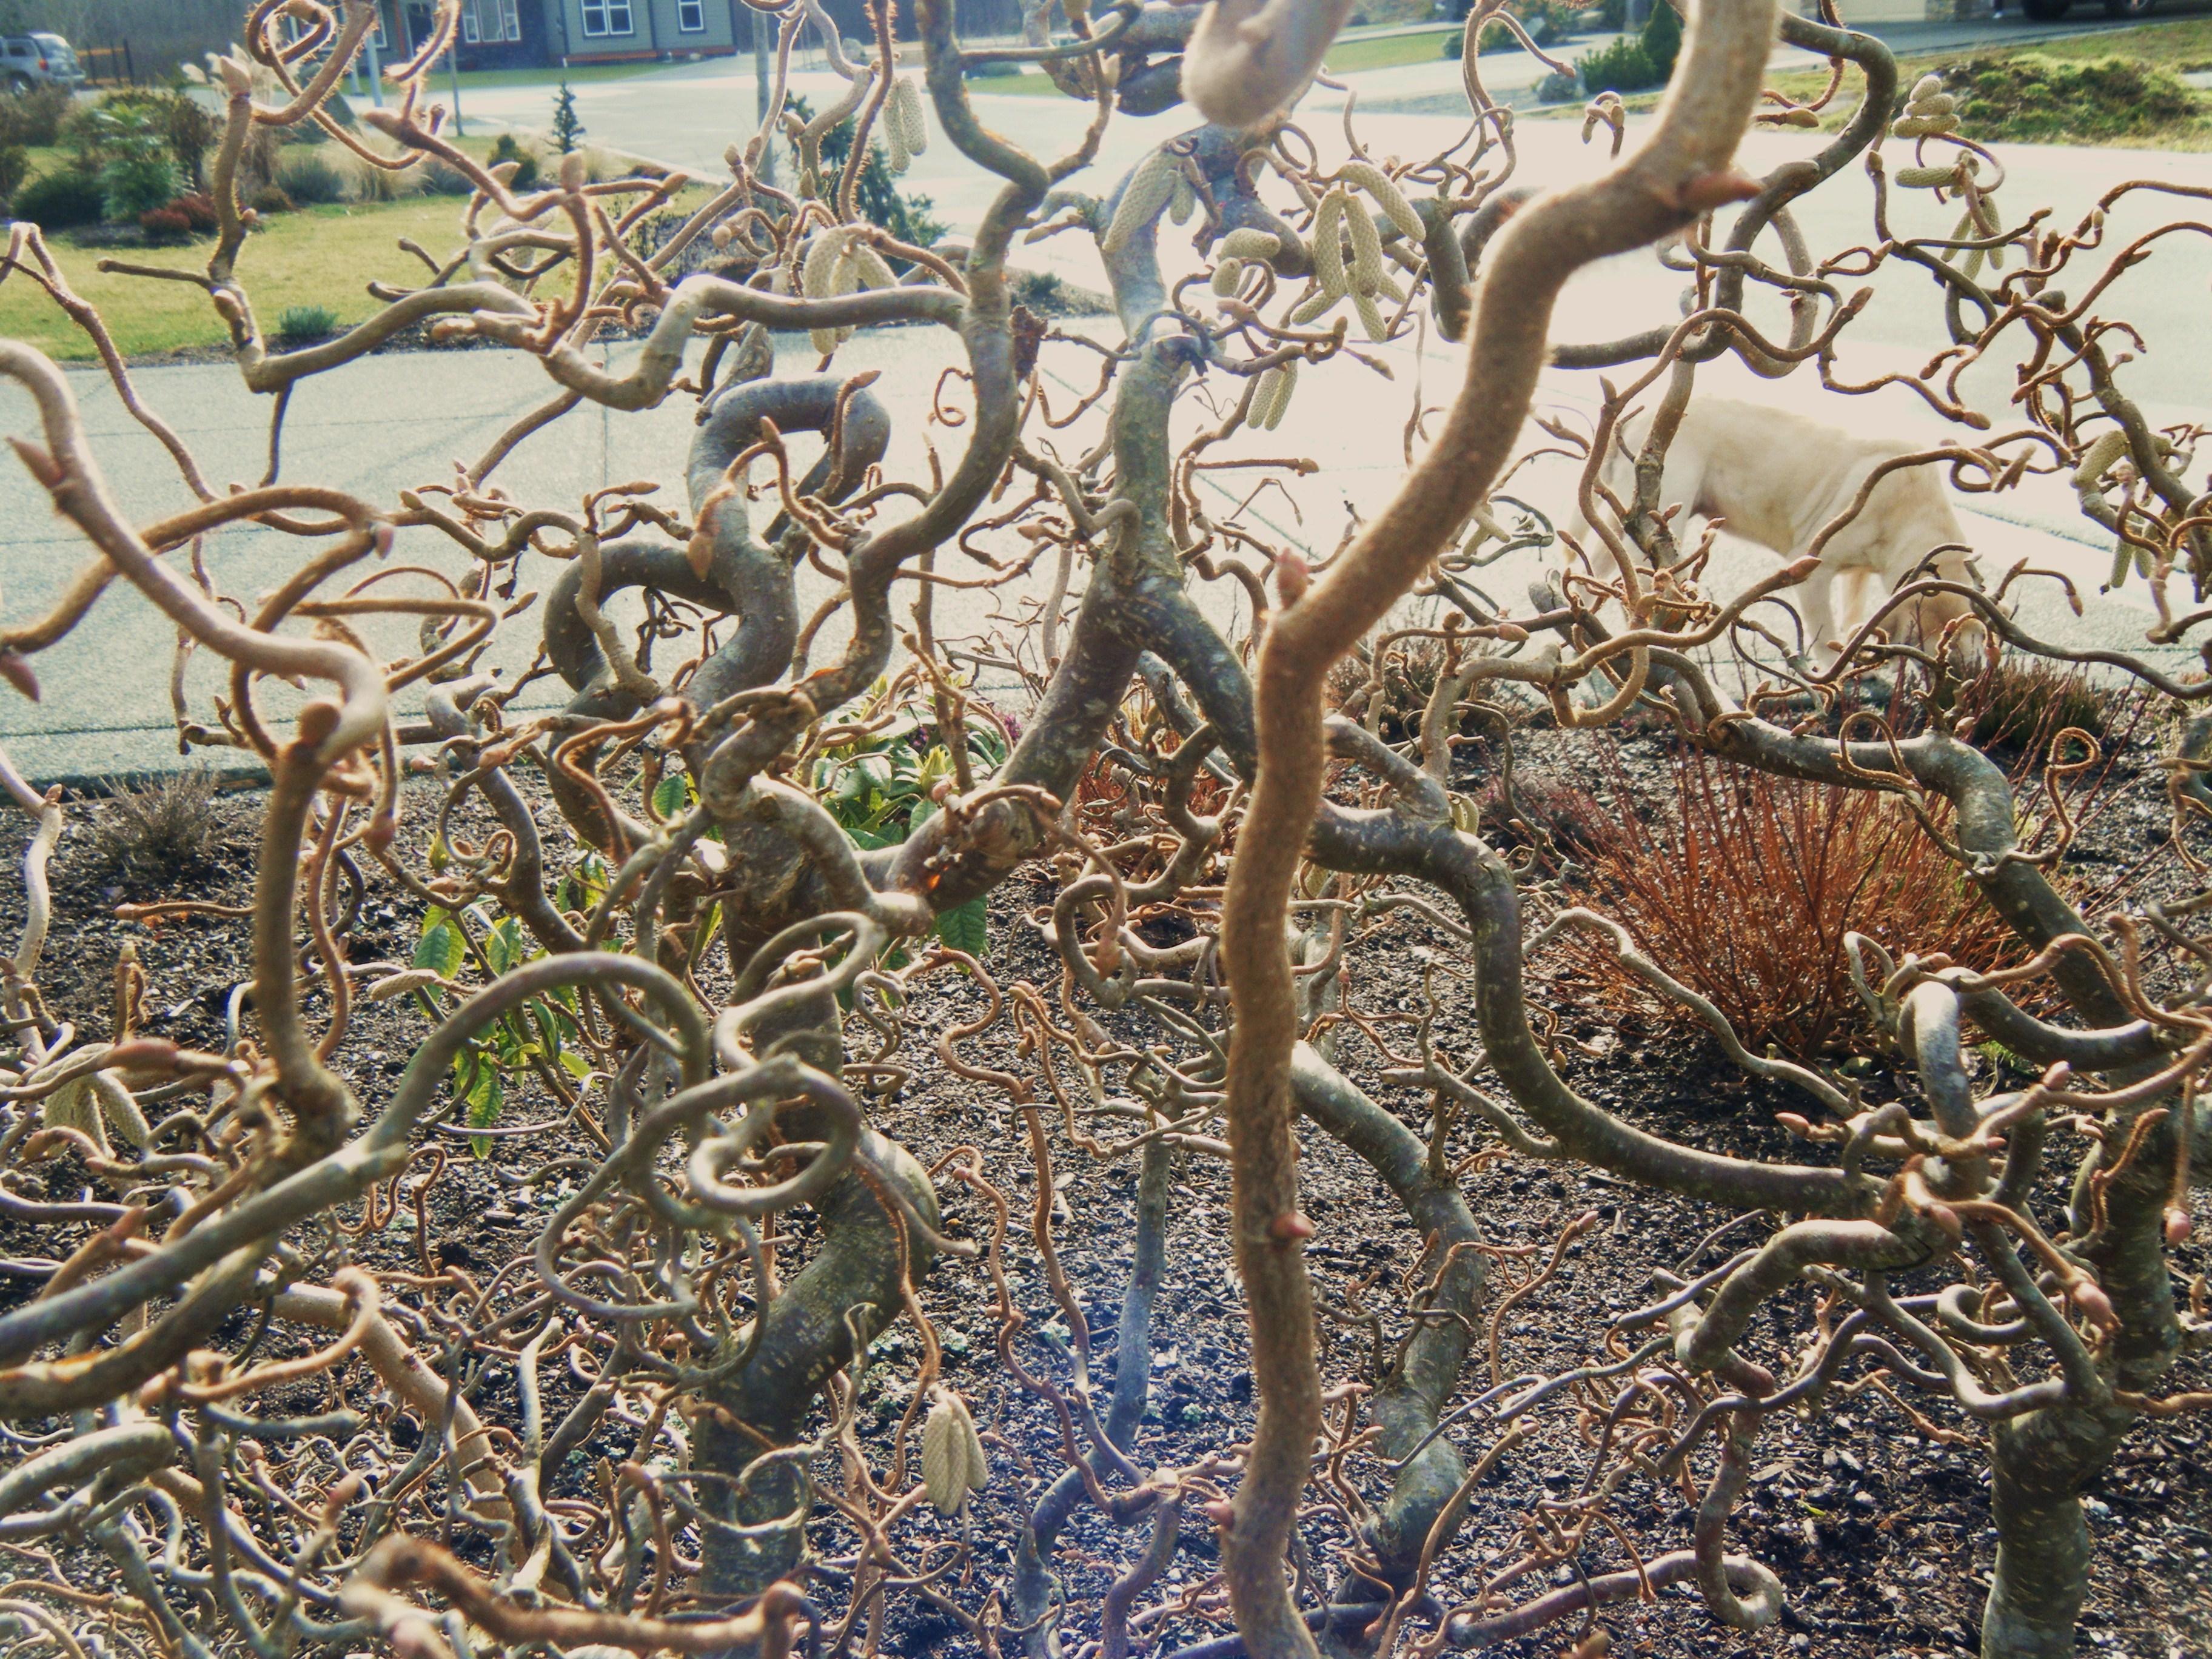 Harry lauder walking stick trees -  Harry Lauder S Walking Stick And Old Man S Walking Stick Corylus Avellana Contorta